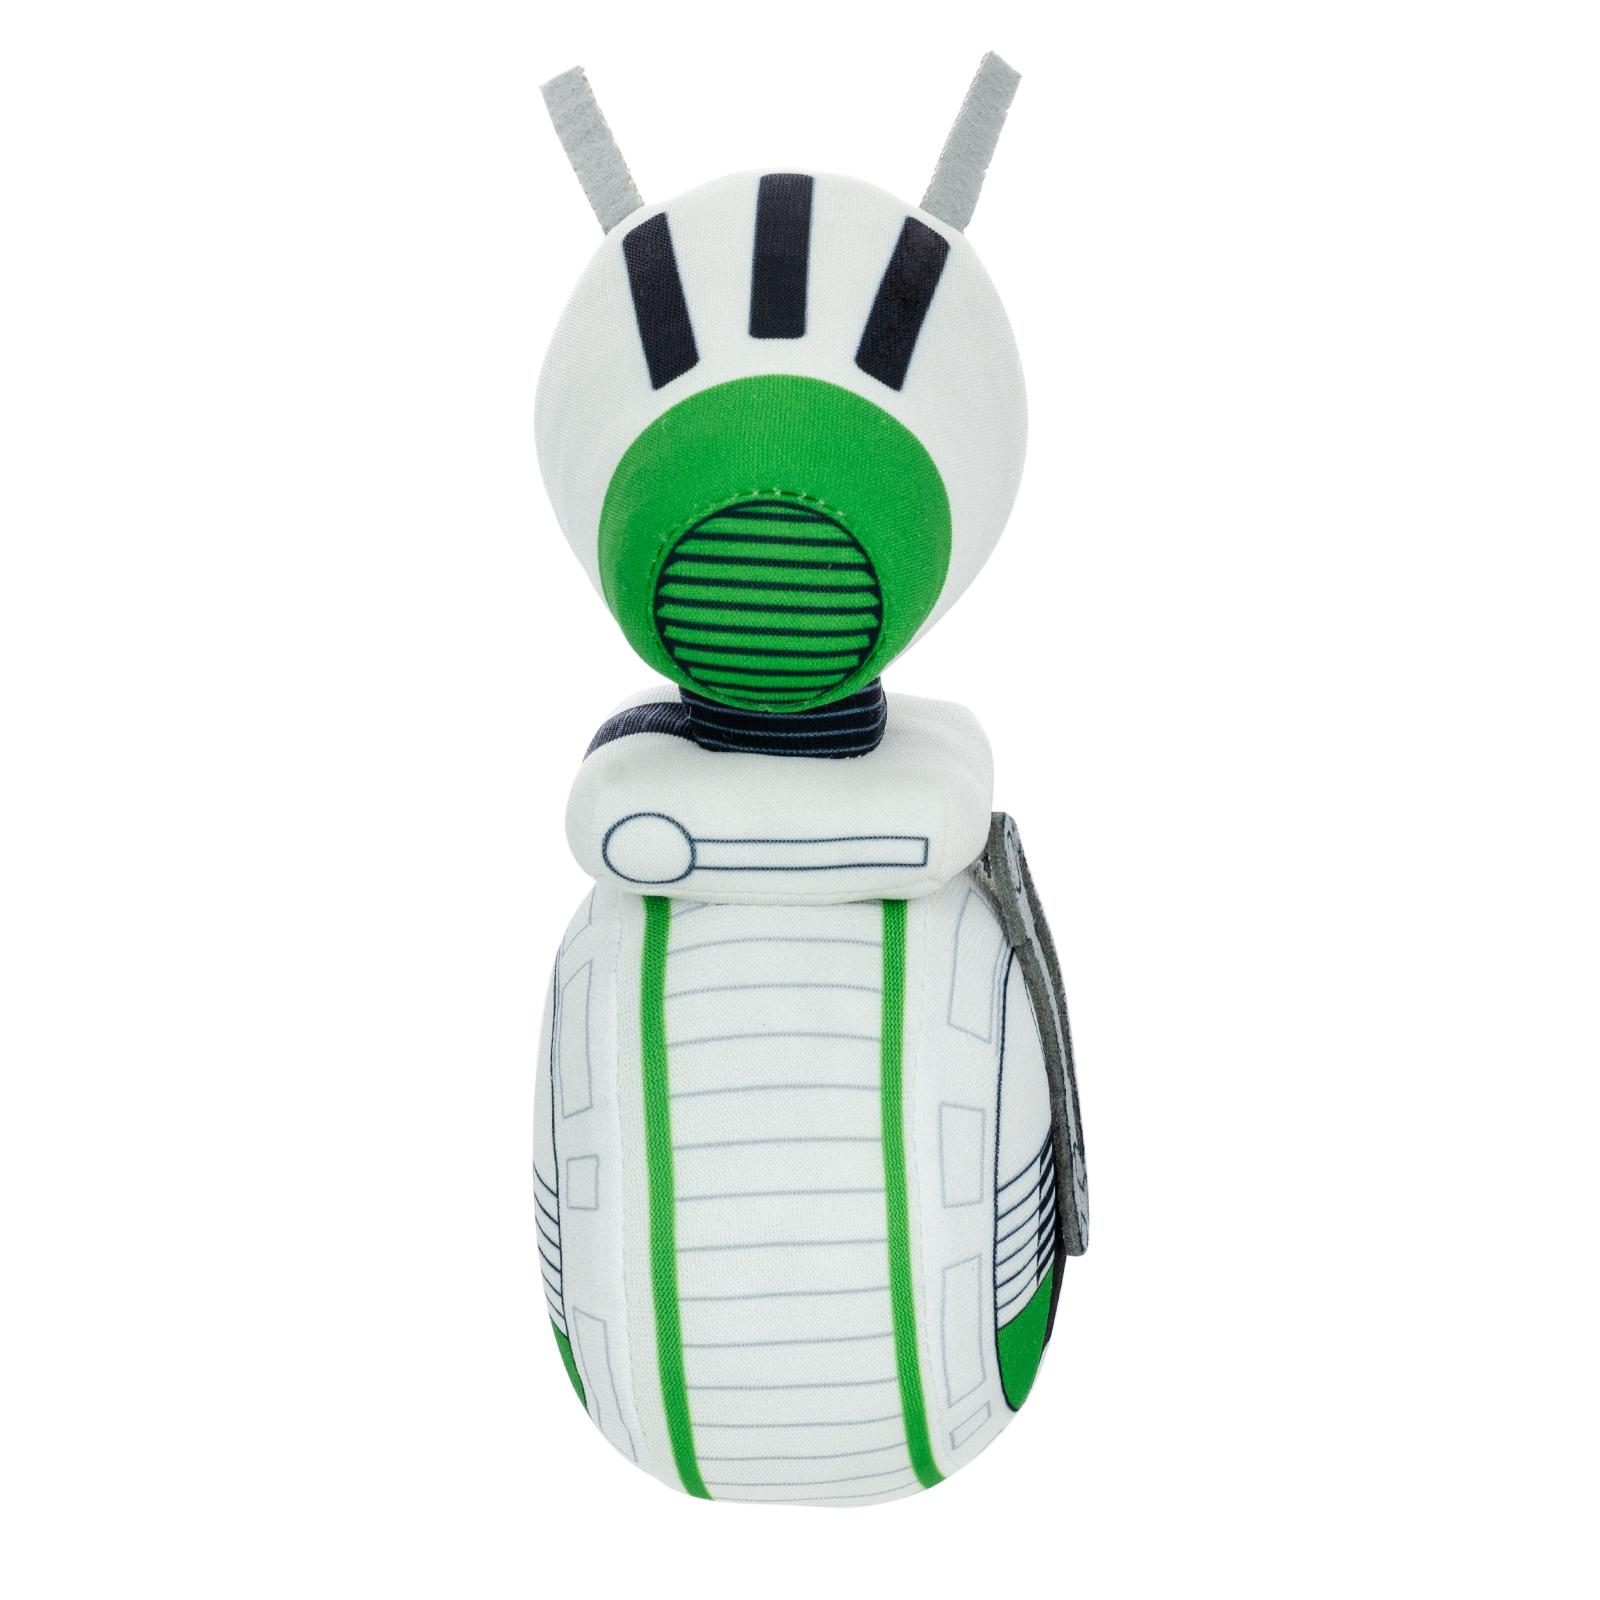 TROS D-O Plush Toy and Pin Set 2